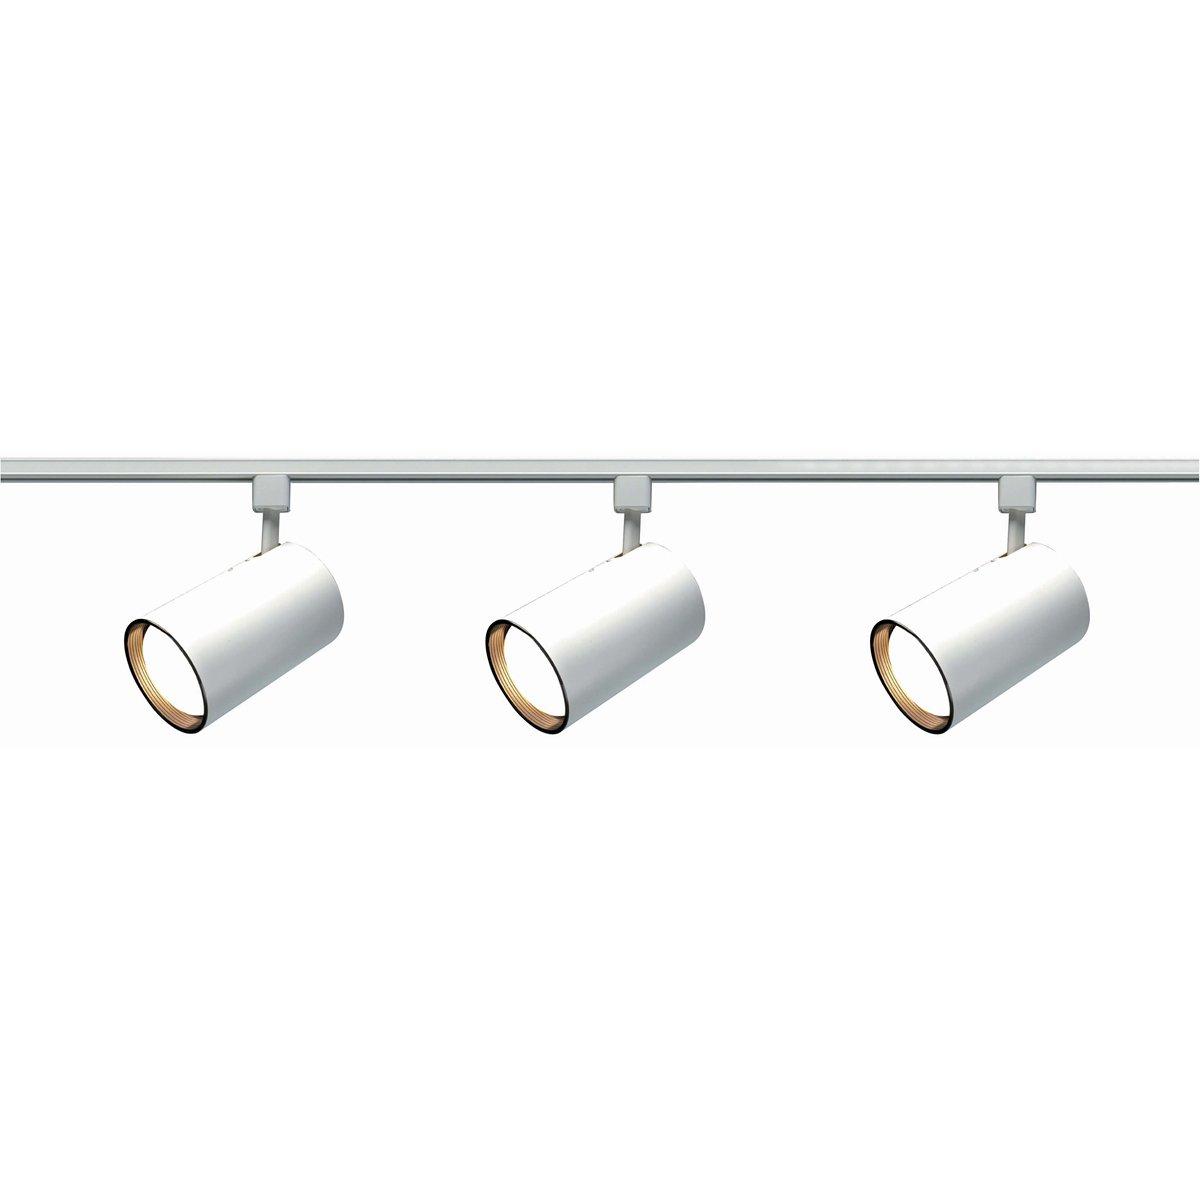 Led Light Design: Cool LED Track Light Fixtures for Ceiling Track.